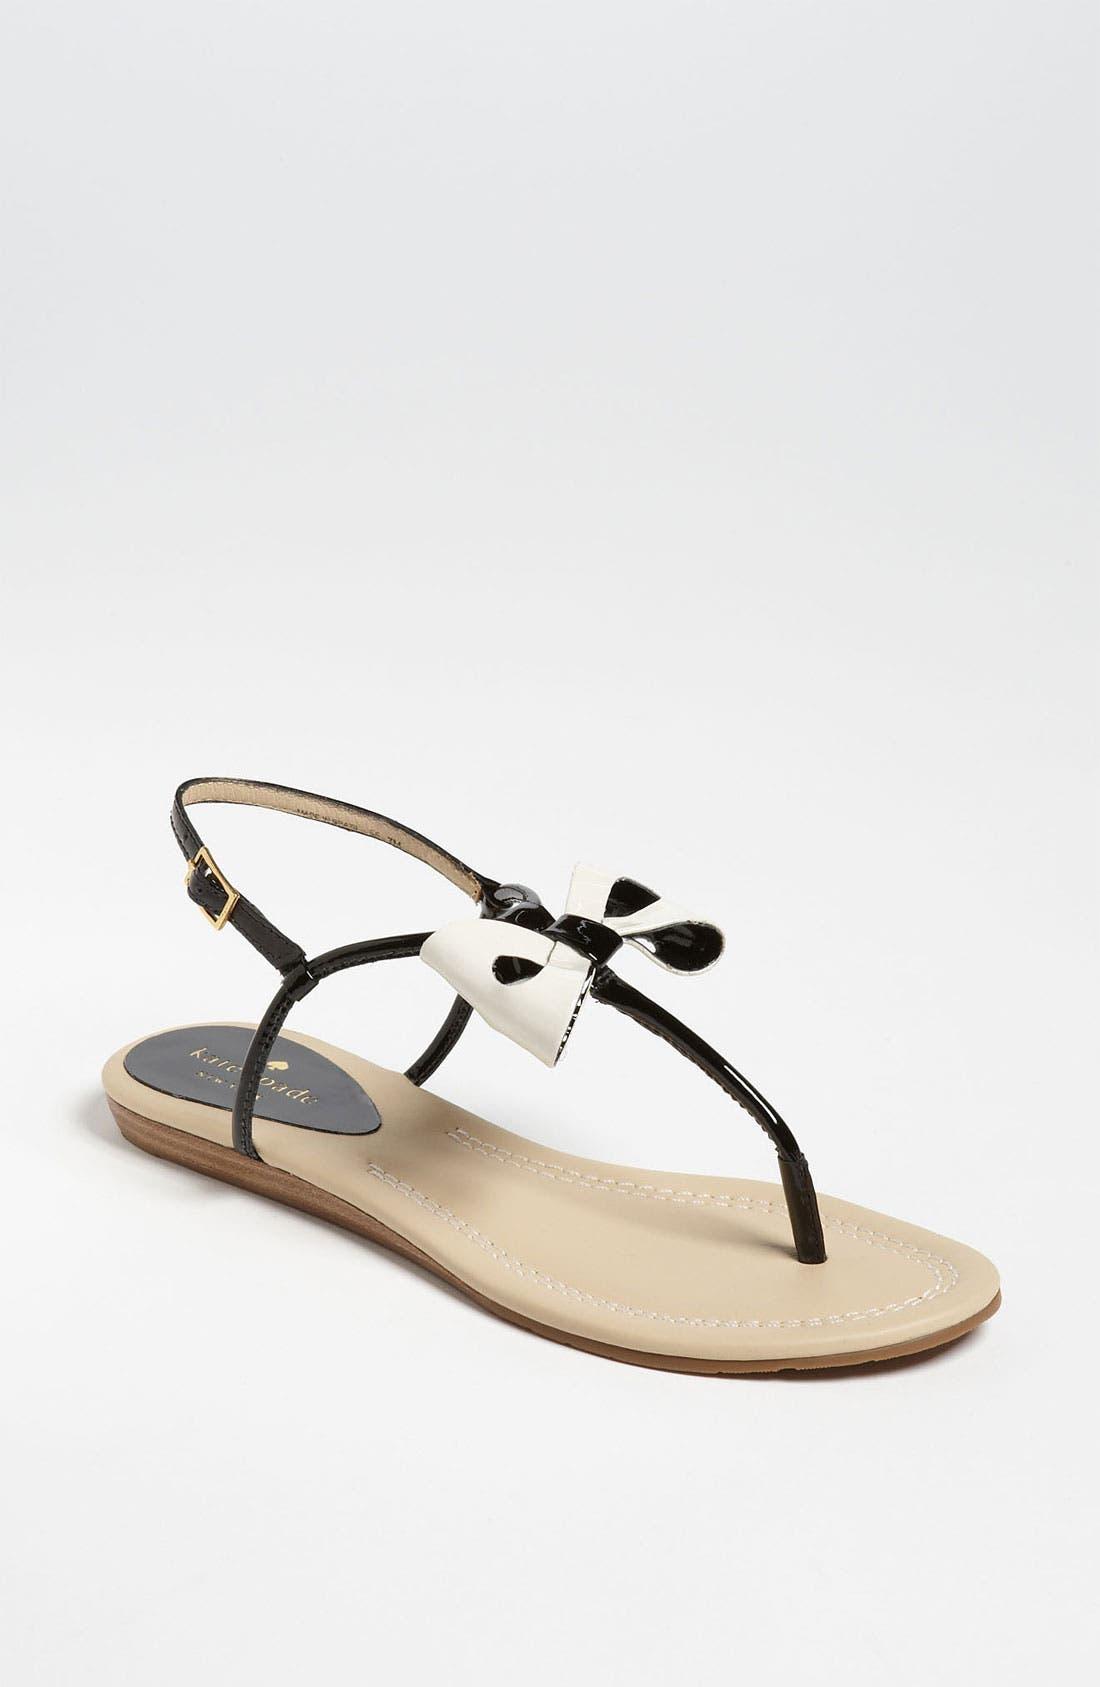 Main Image - kate spade new york 'trendy' sandal